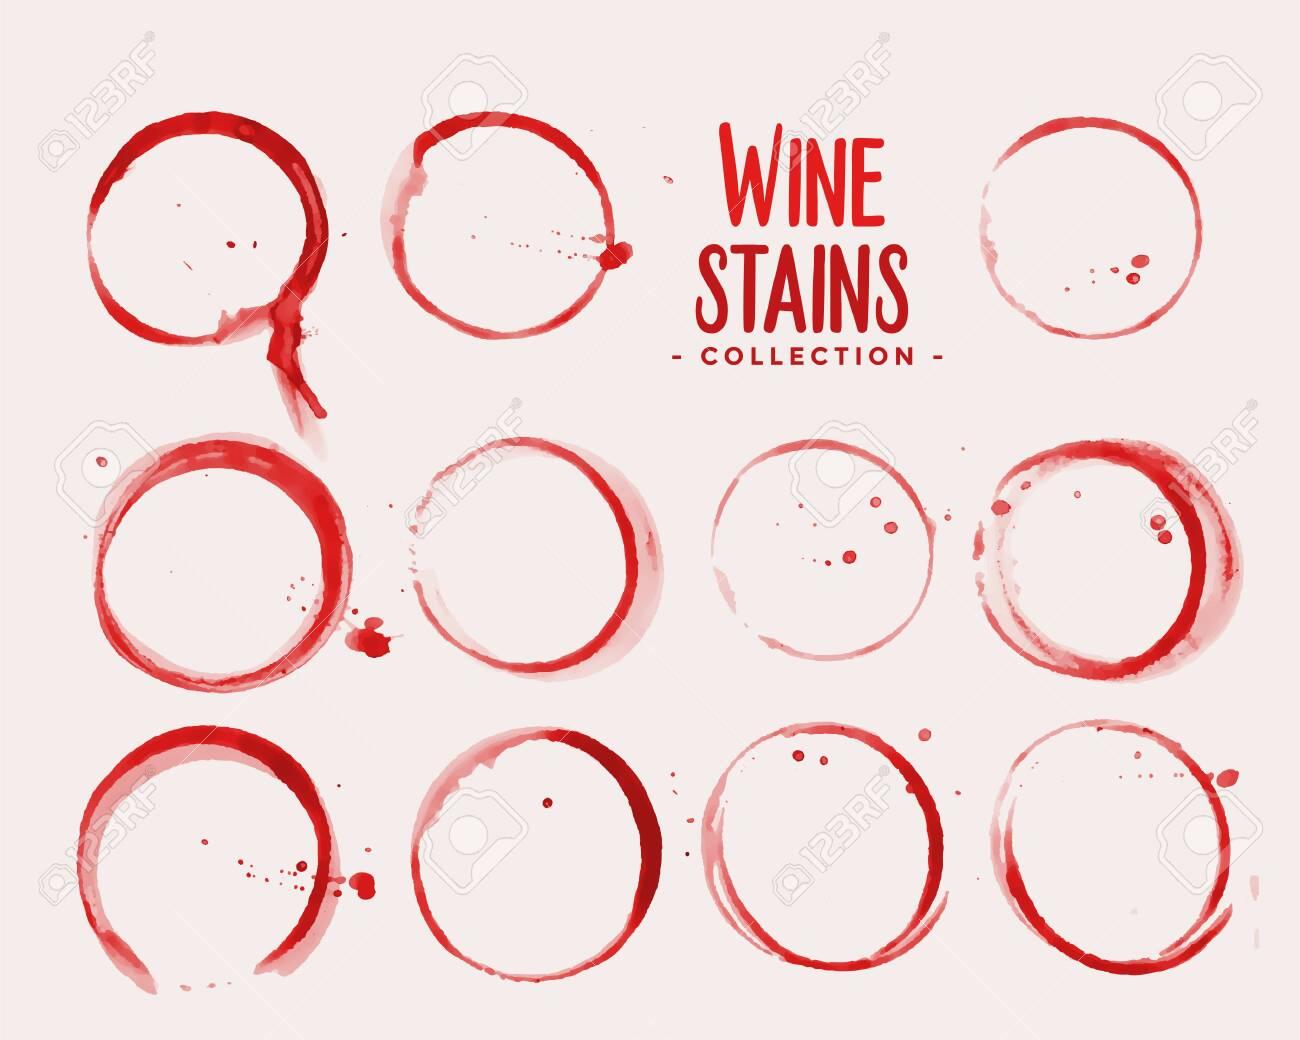 wine glass stain texture set design - 155093113